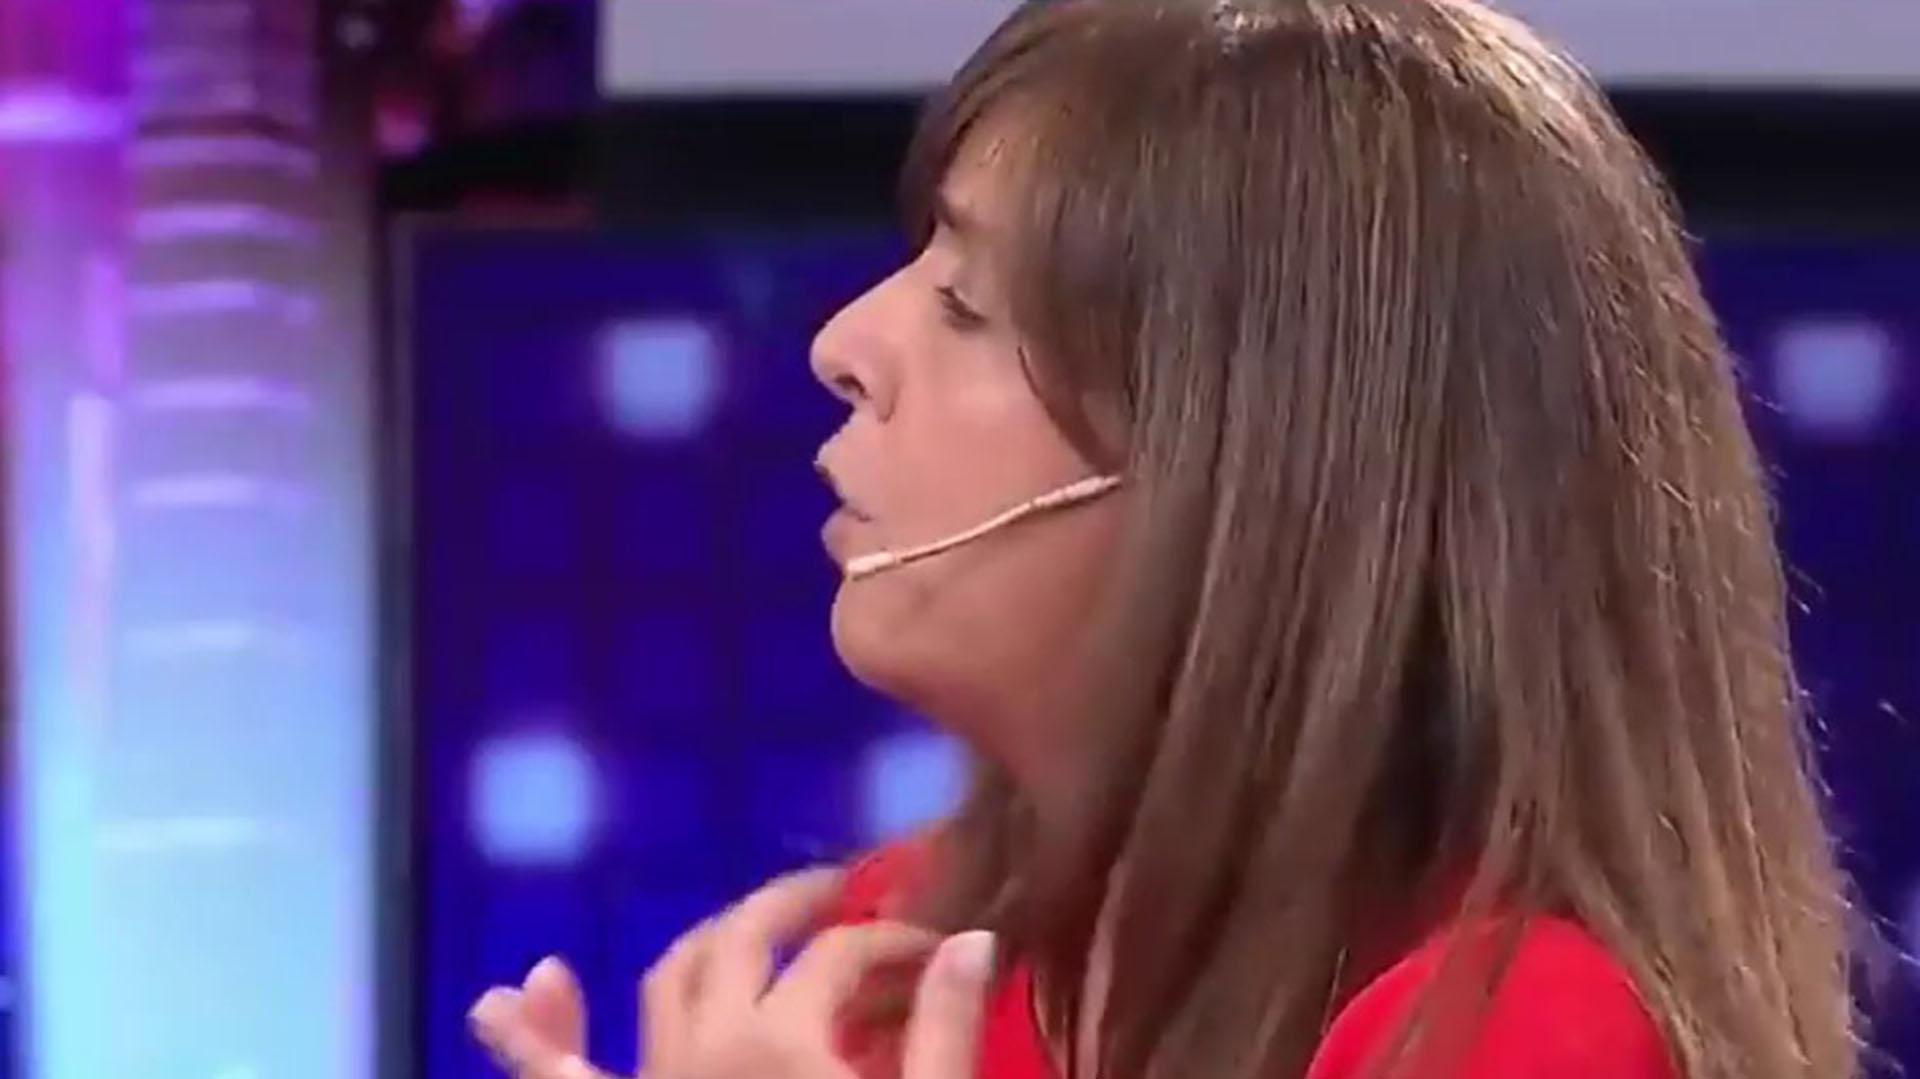 Excelente Vestidos De Novia Tetona Molde - Vestido de Novia Para Las ...